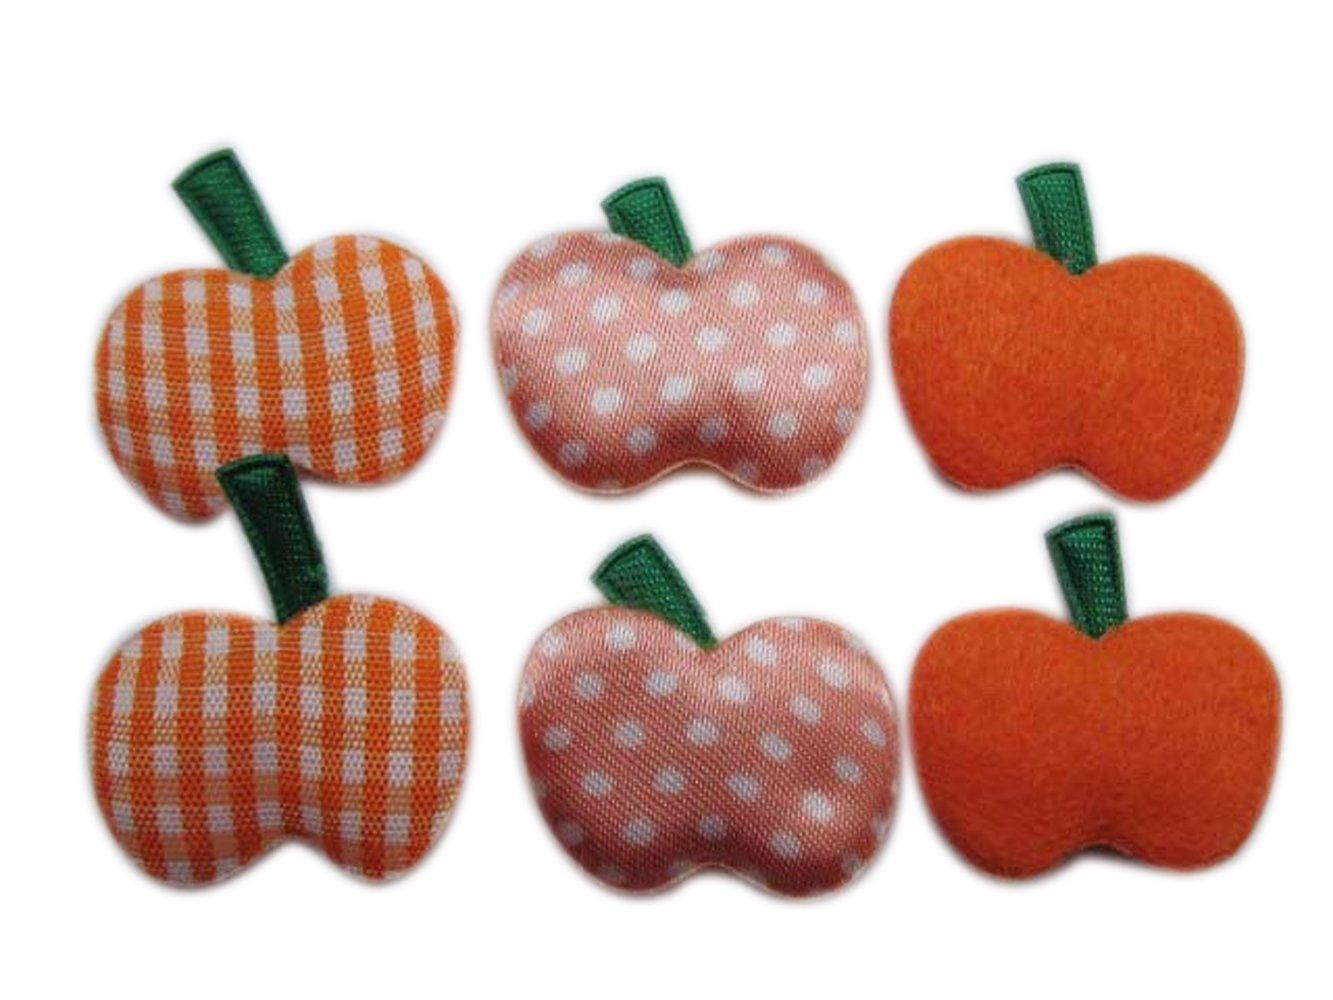 YYCRAFT Pack Of 60 Felt/Satin Pumpkin Applique/Halloween/motif/bows-3 Colors